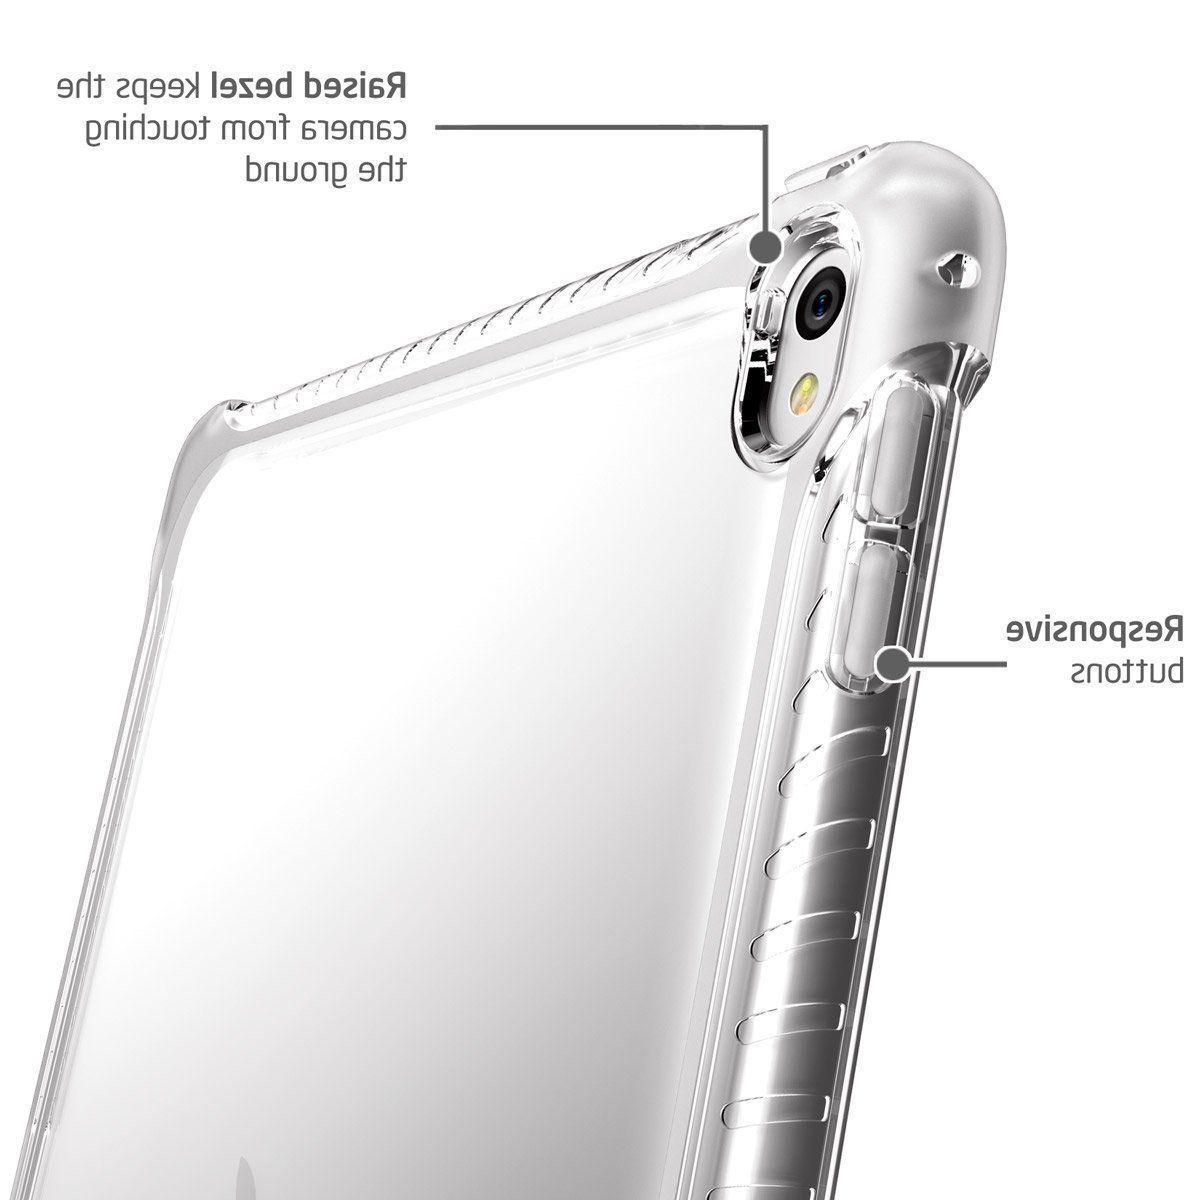 "For Apple Pro 9.7"" Tablet Case, i-Blason Slim Profile TPU Cover"